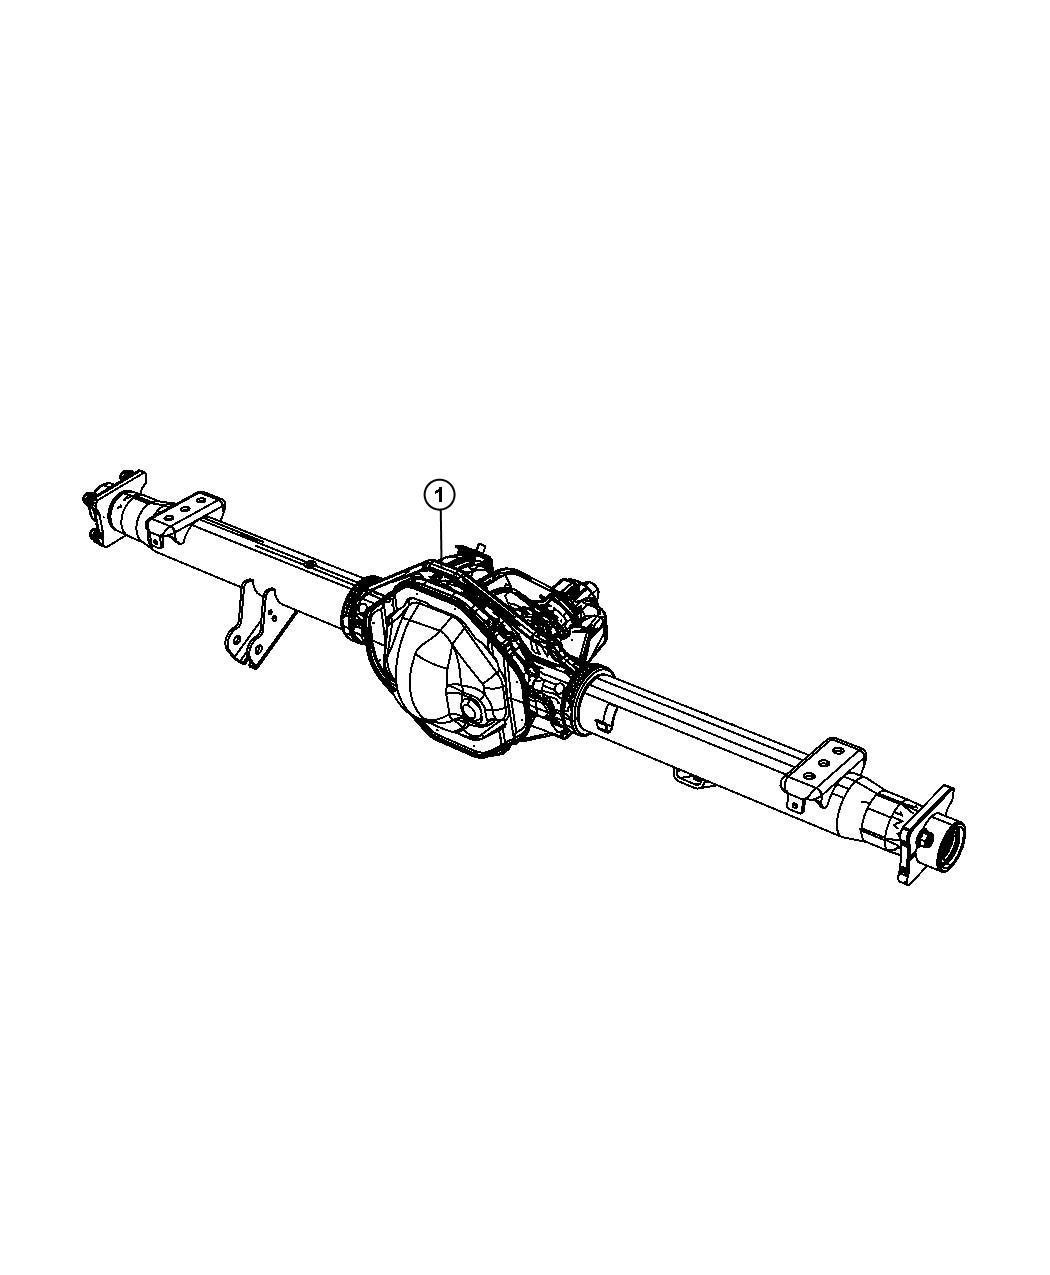 Dodge Ram Axle Service Rear Anti Ratio Spin